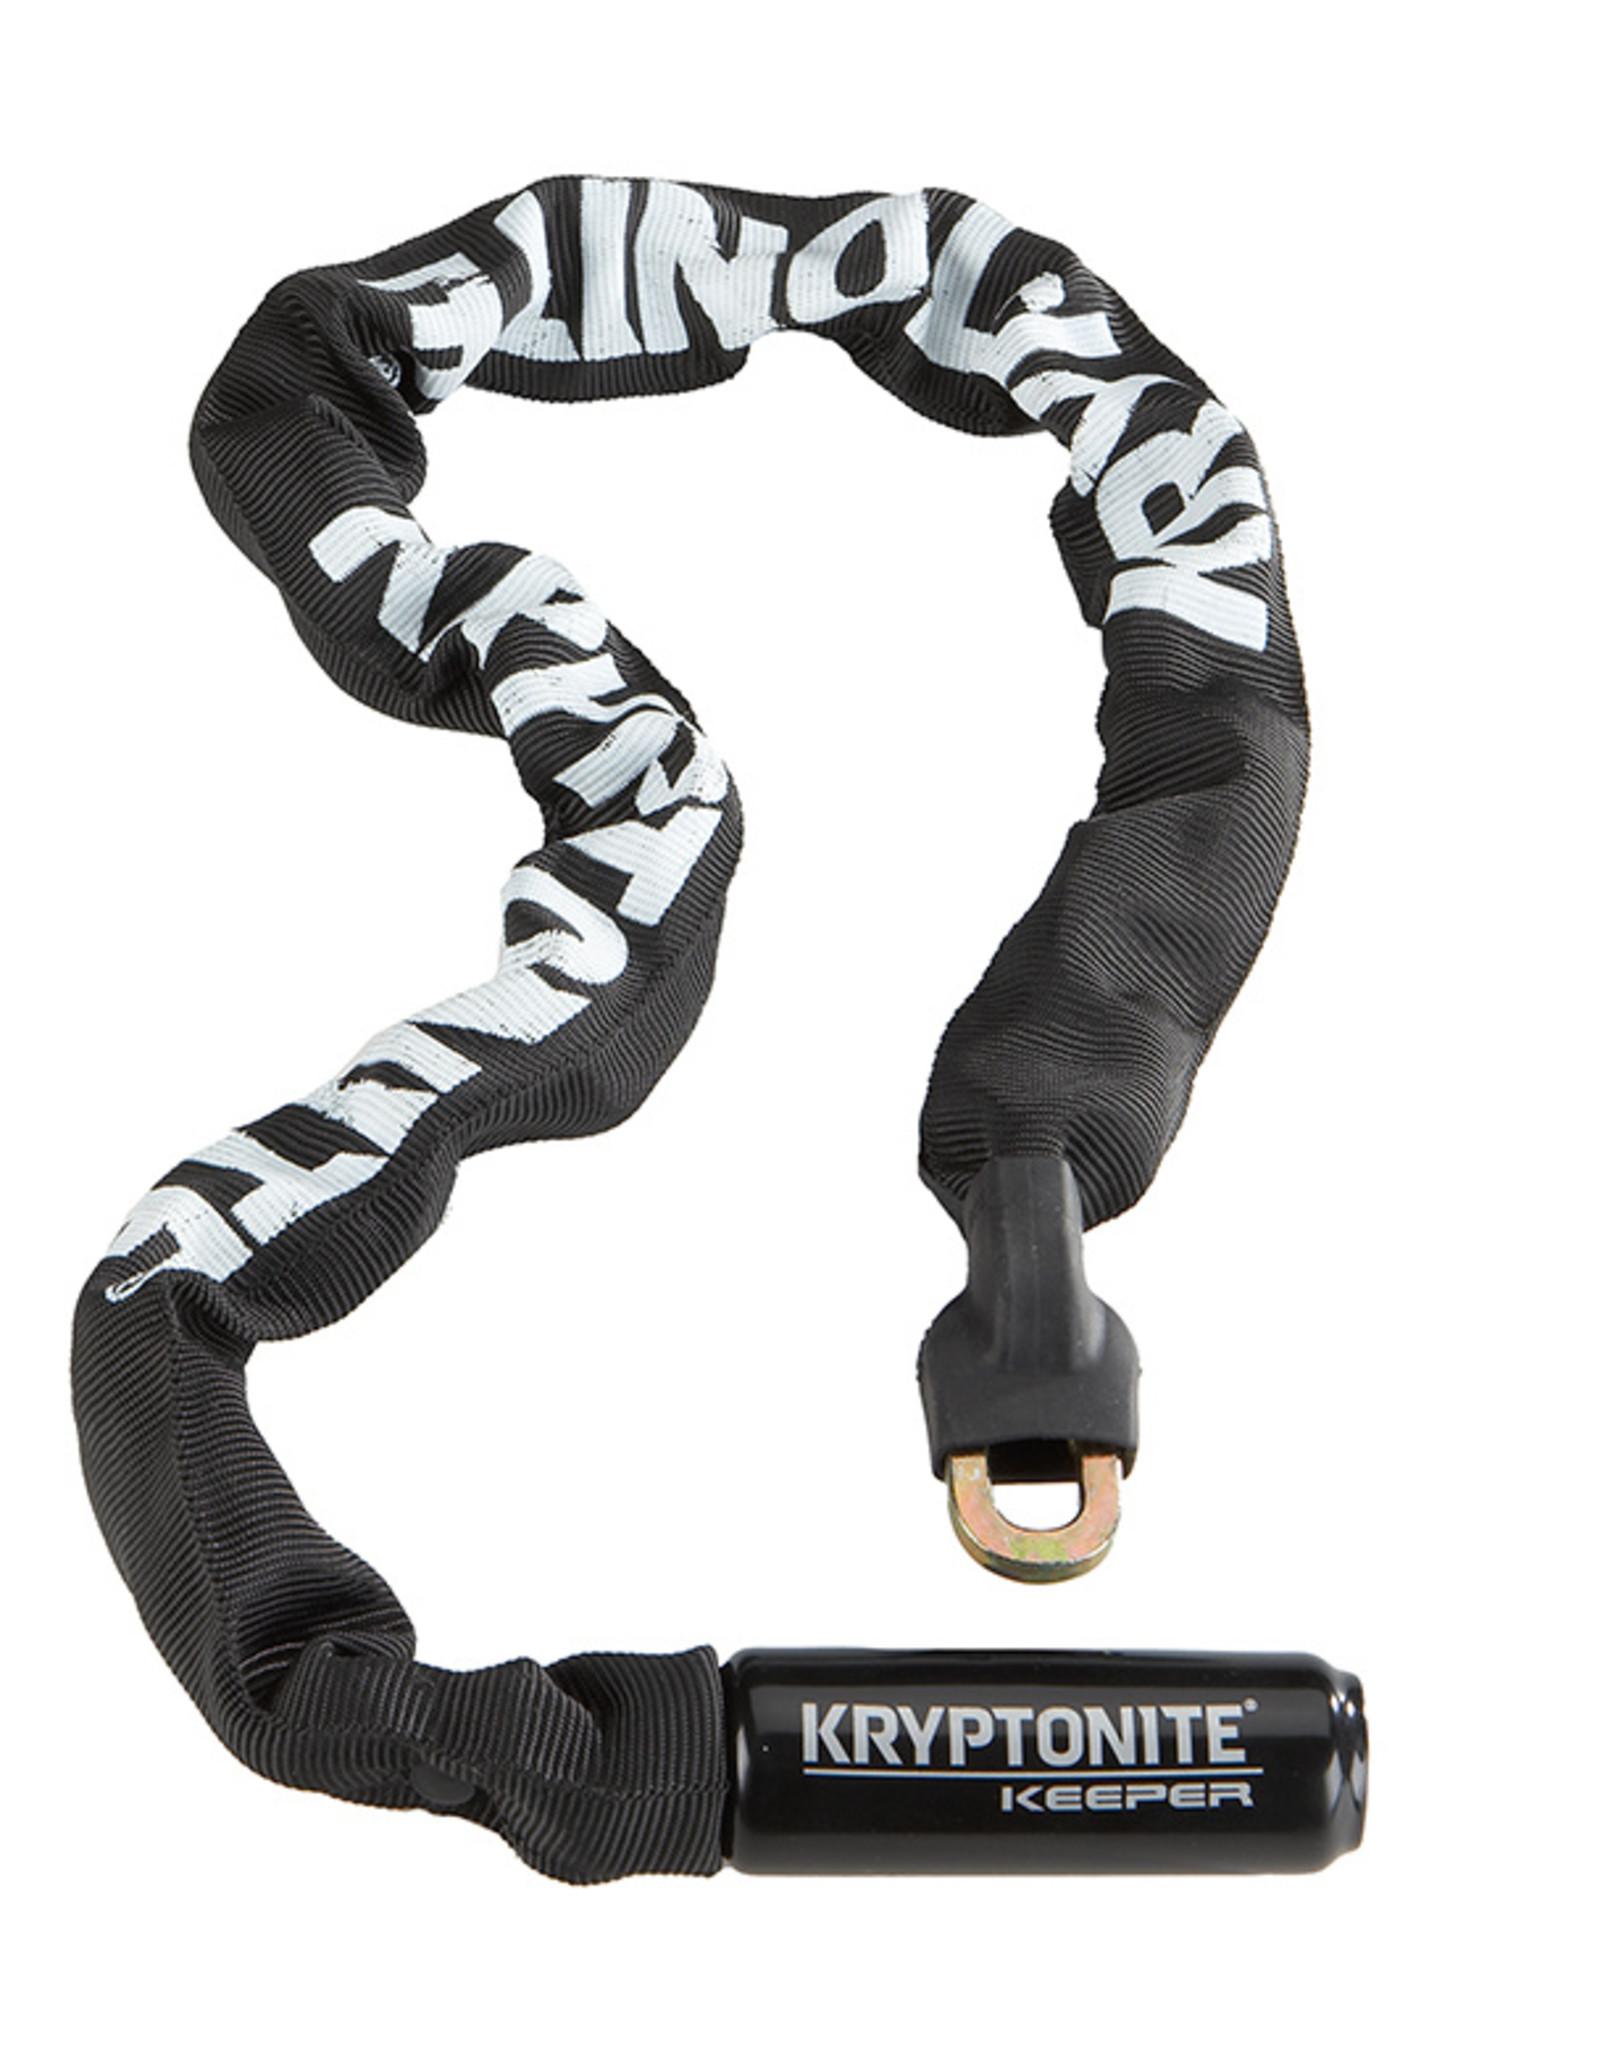 Kryptonite Keeper 785 Integrated Chain (7 mm 85 cm)